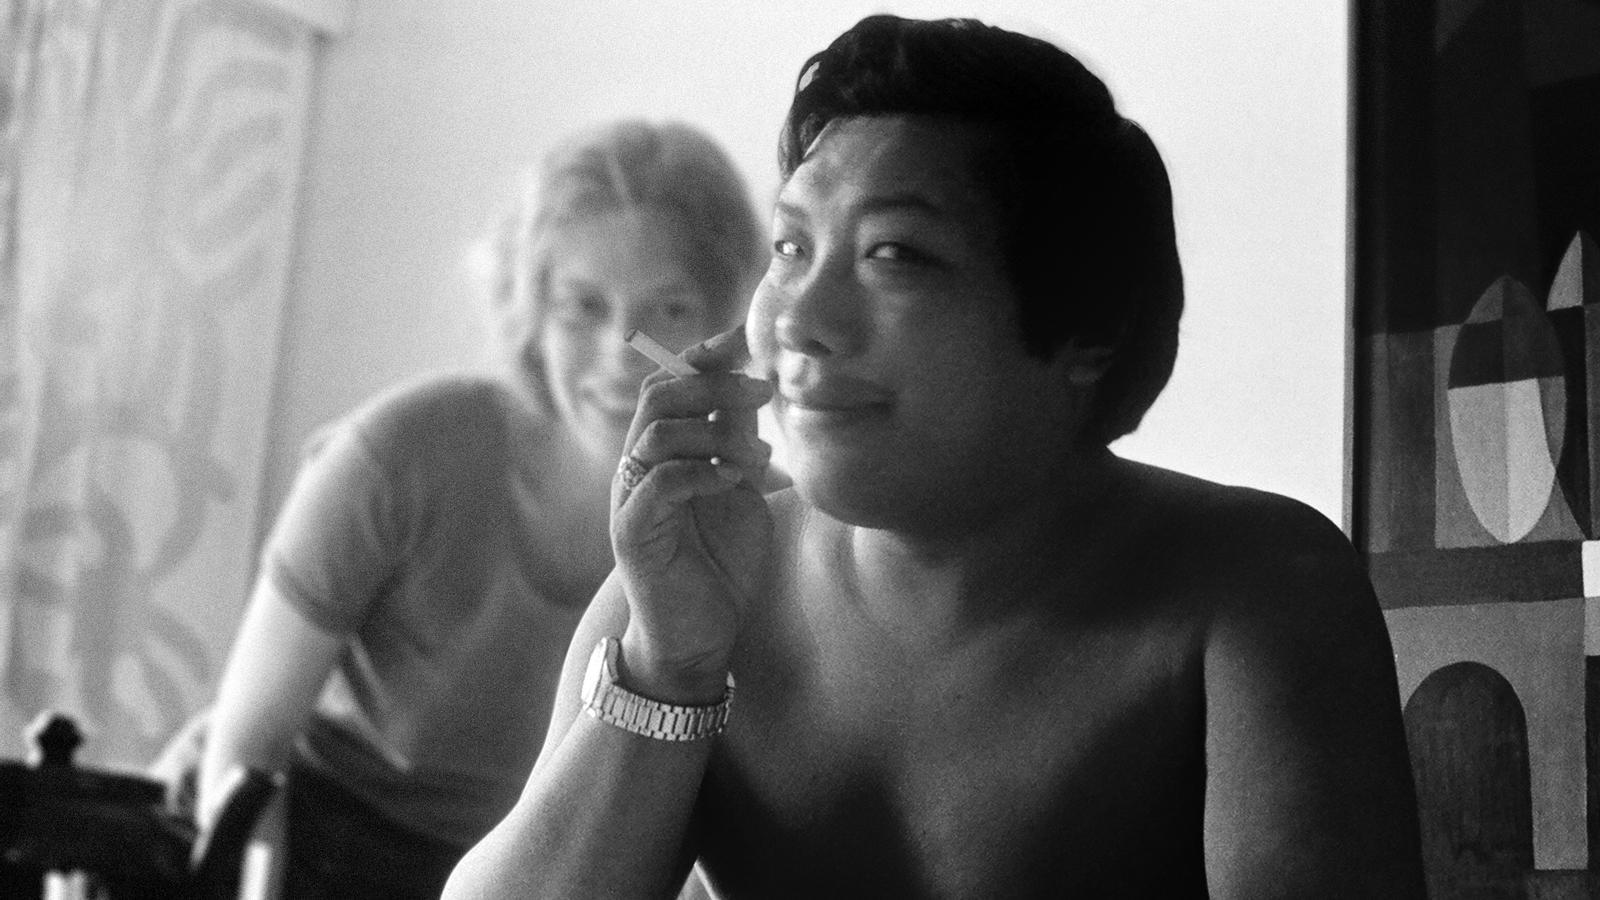 fotograma del documental 'Crazy Wisdom' de Johanna Demetrakas sobre la vida de Chogyam Trungpa